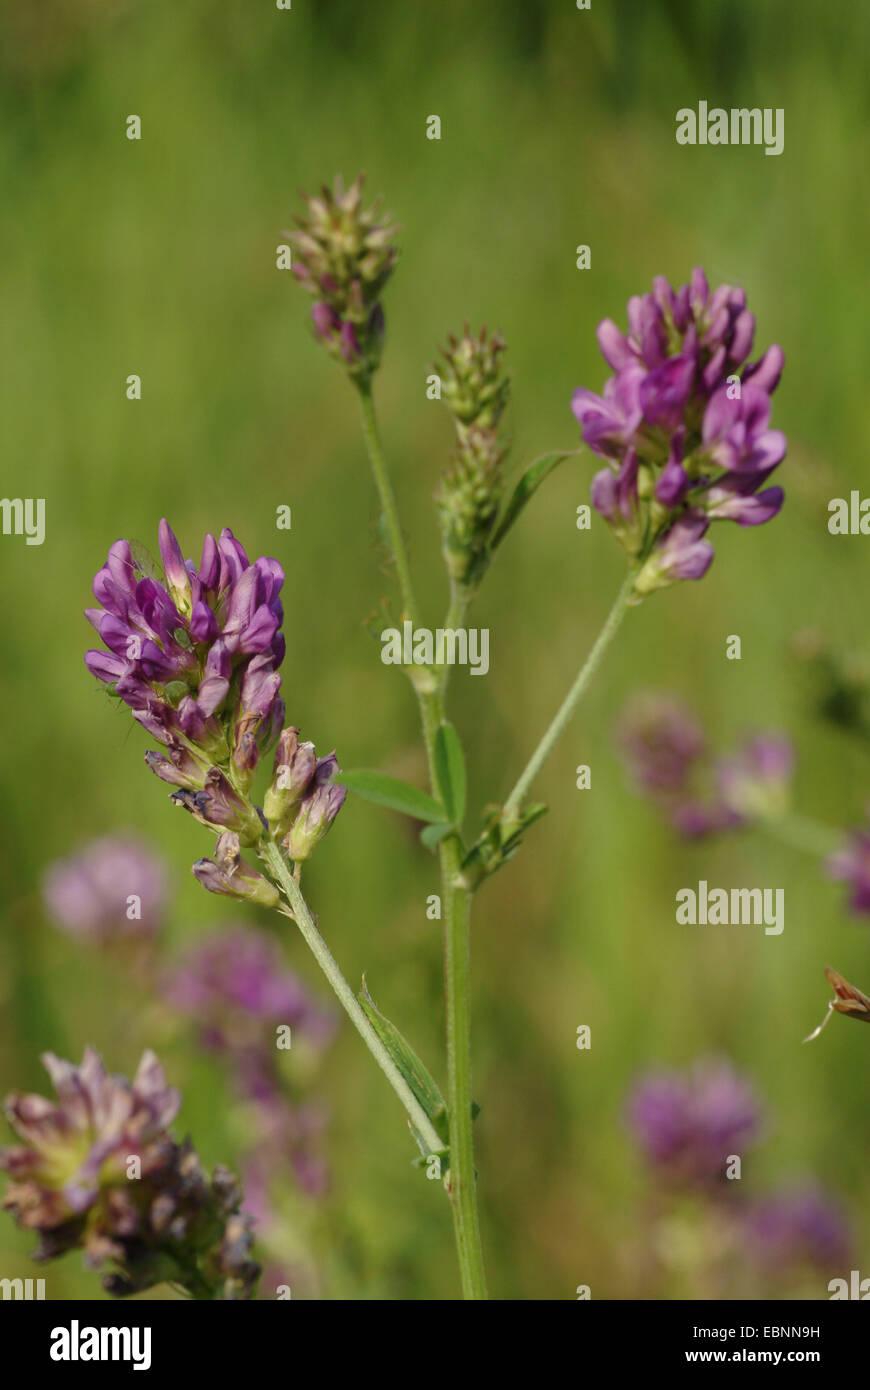 alfalfa, lucerne (Medicago sativa agg., Medicago x varia, Medicago varia), blooming - Stock Image